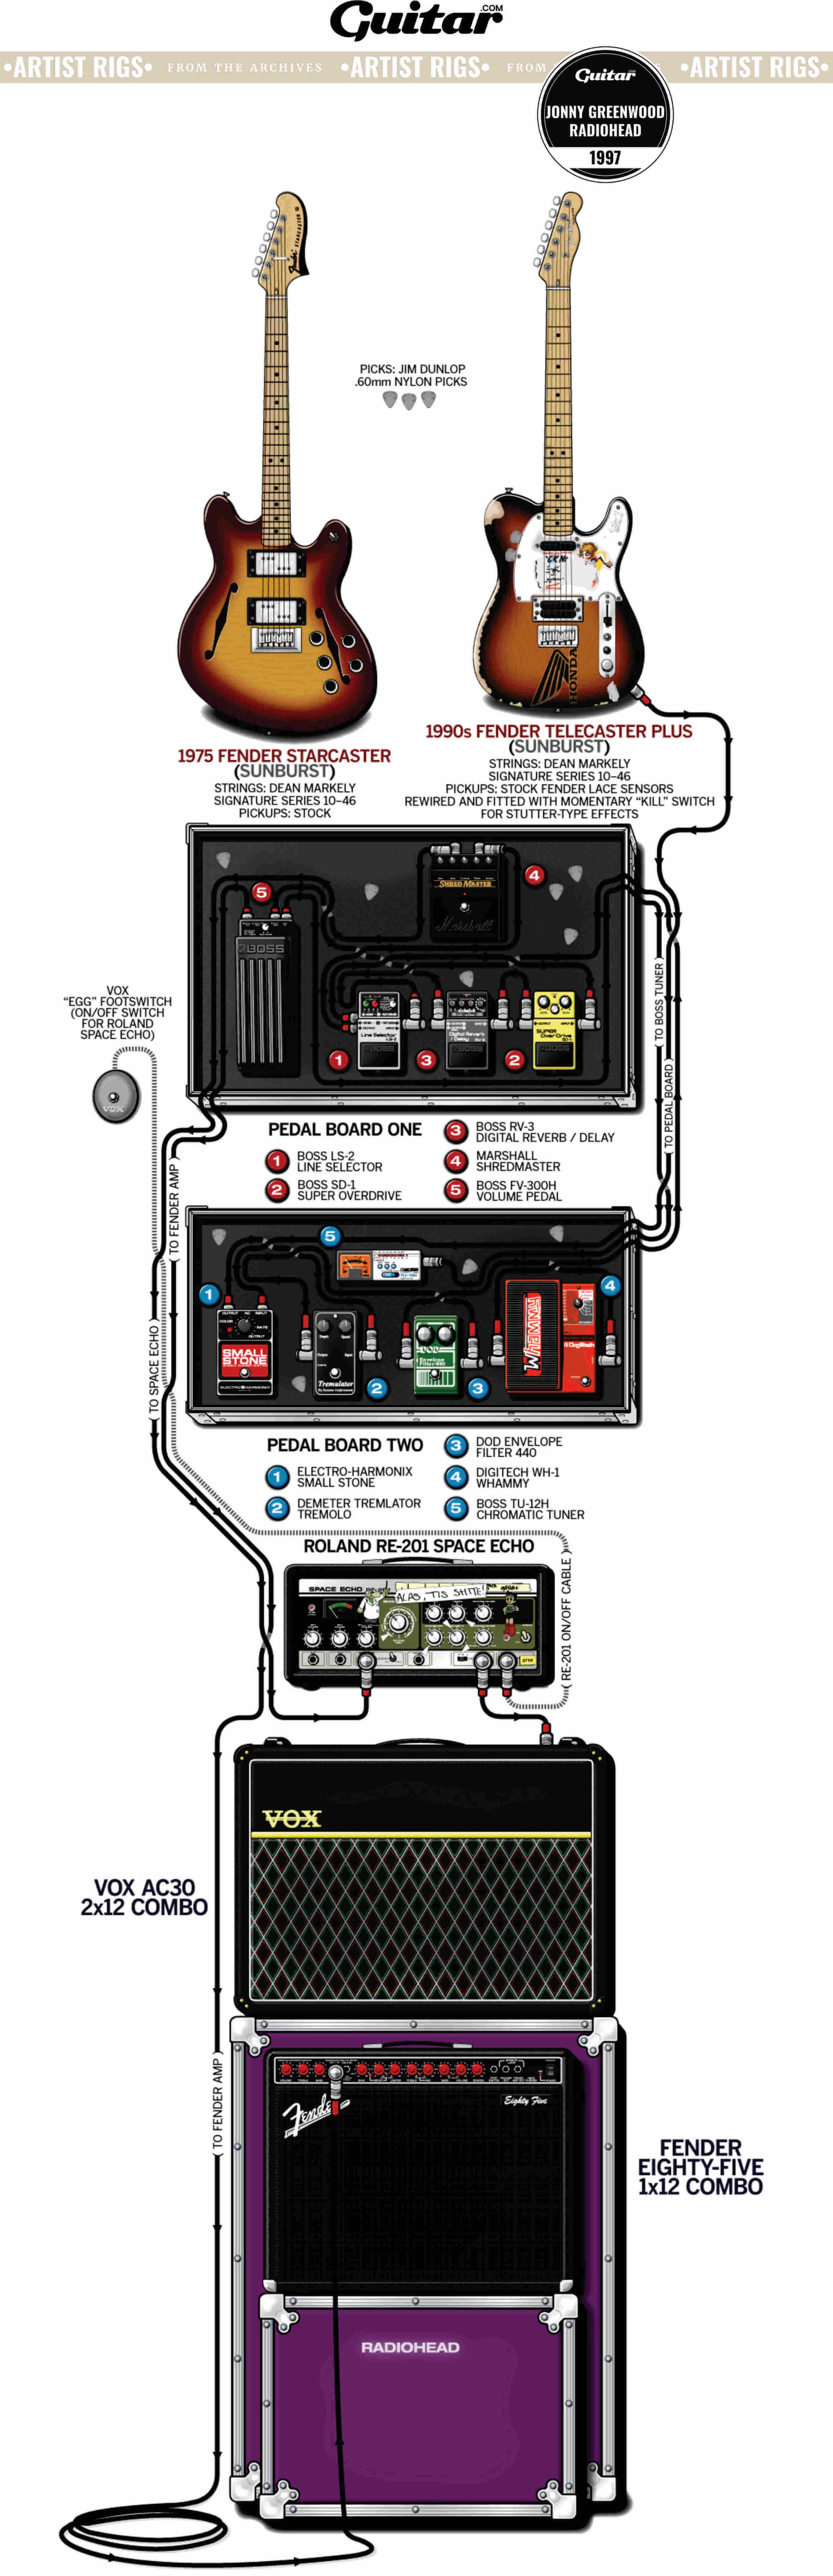 Rig Diagram: Jonny Greenwood, Radiohead (1997)